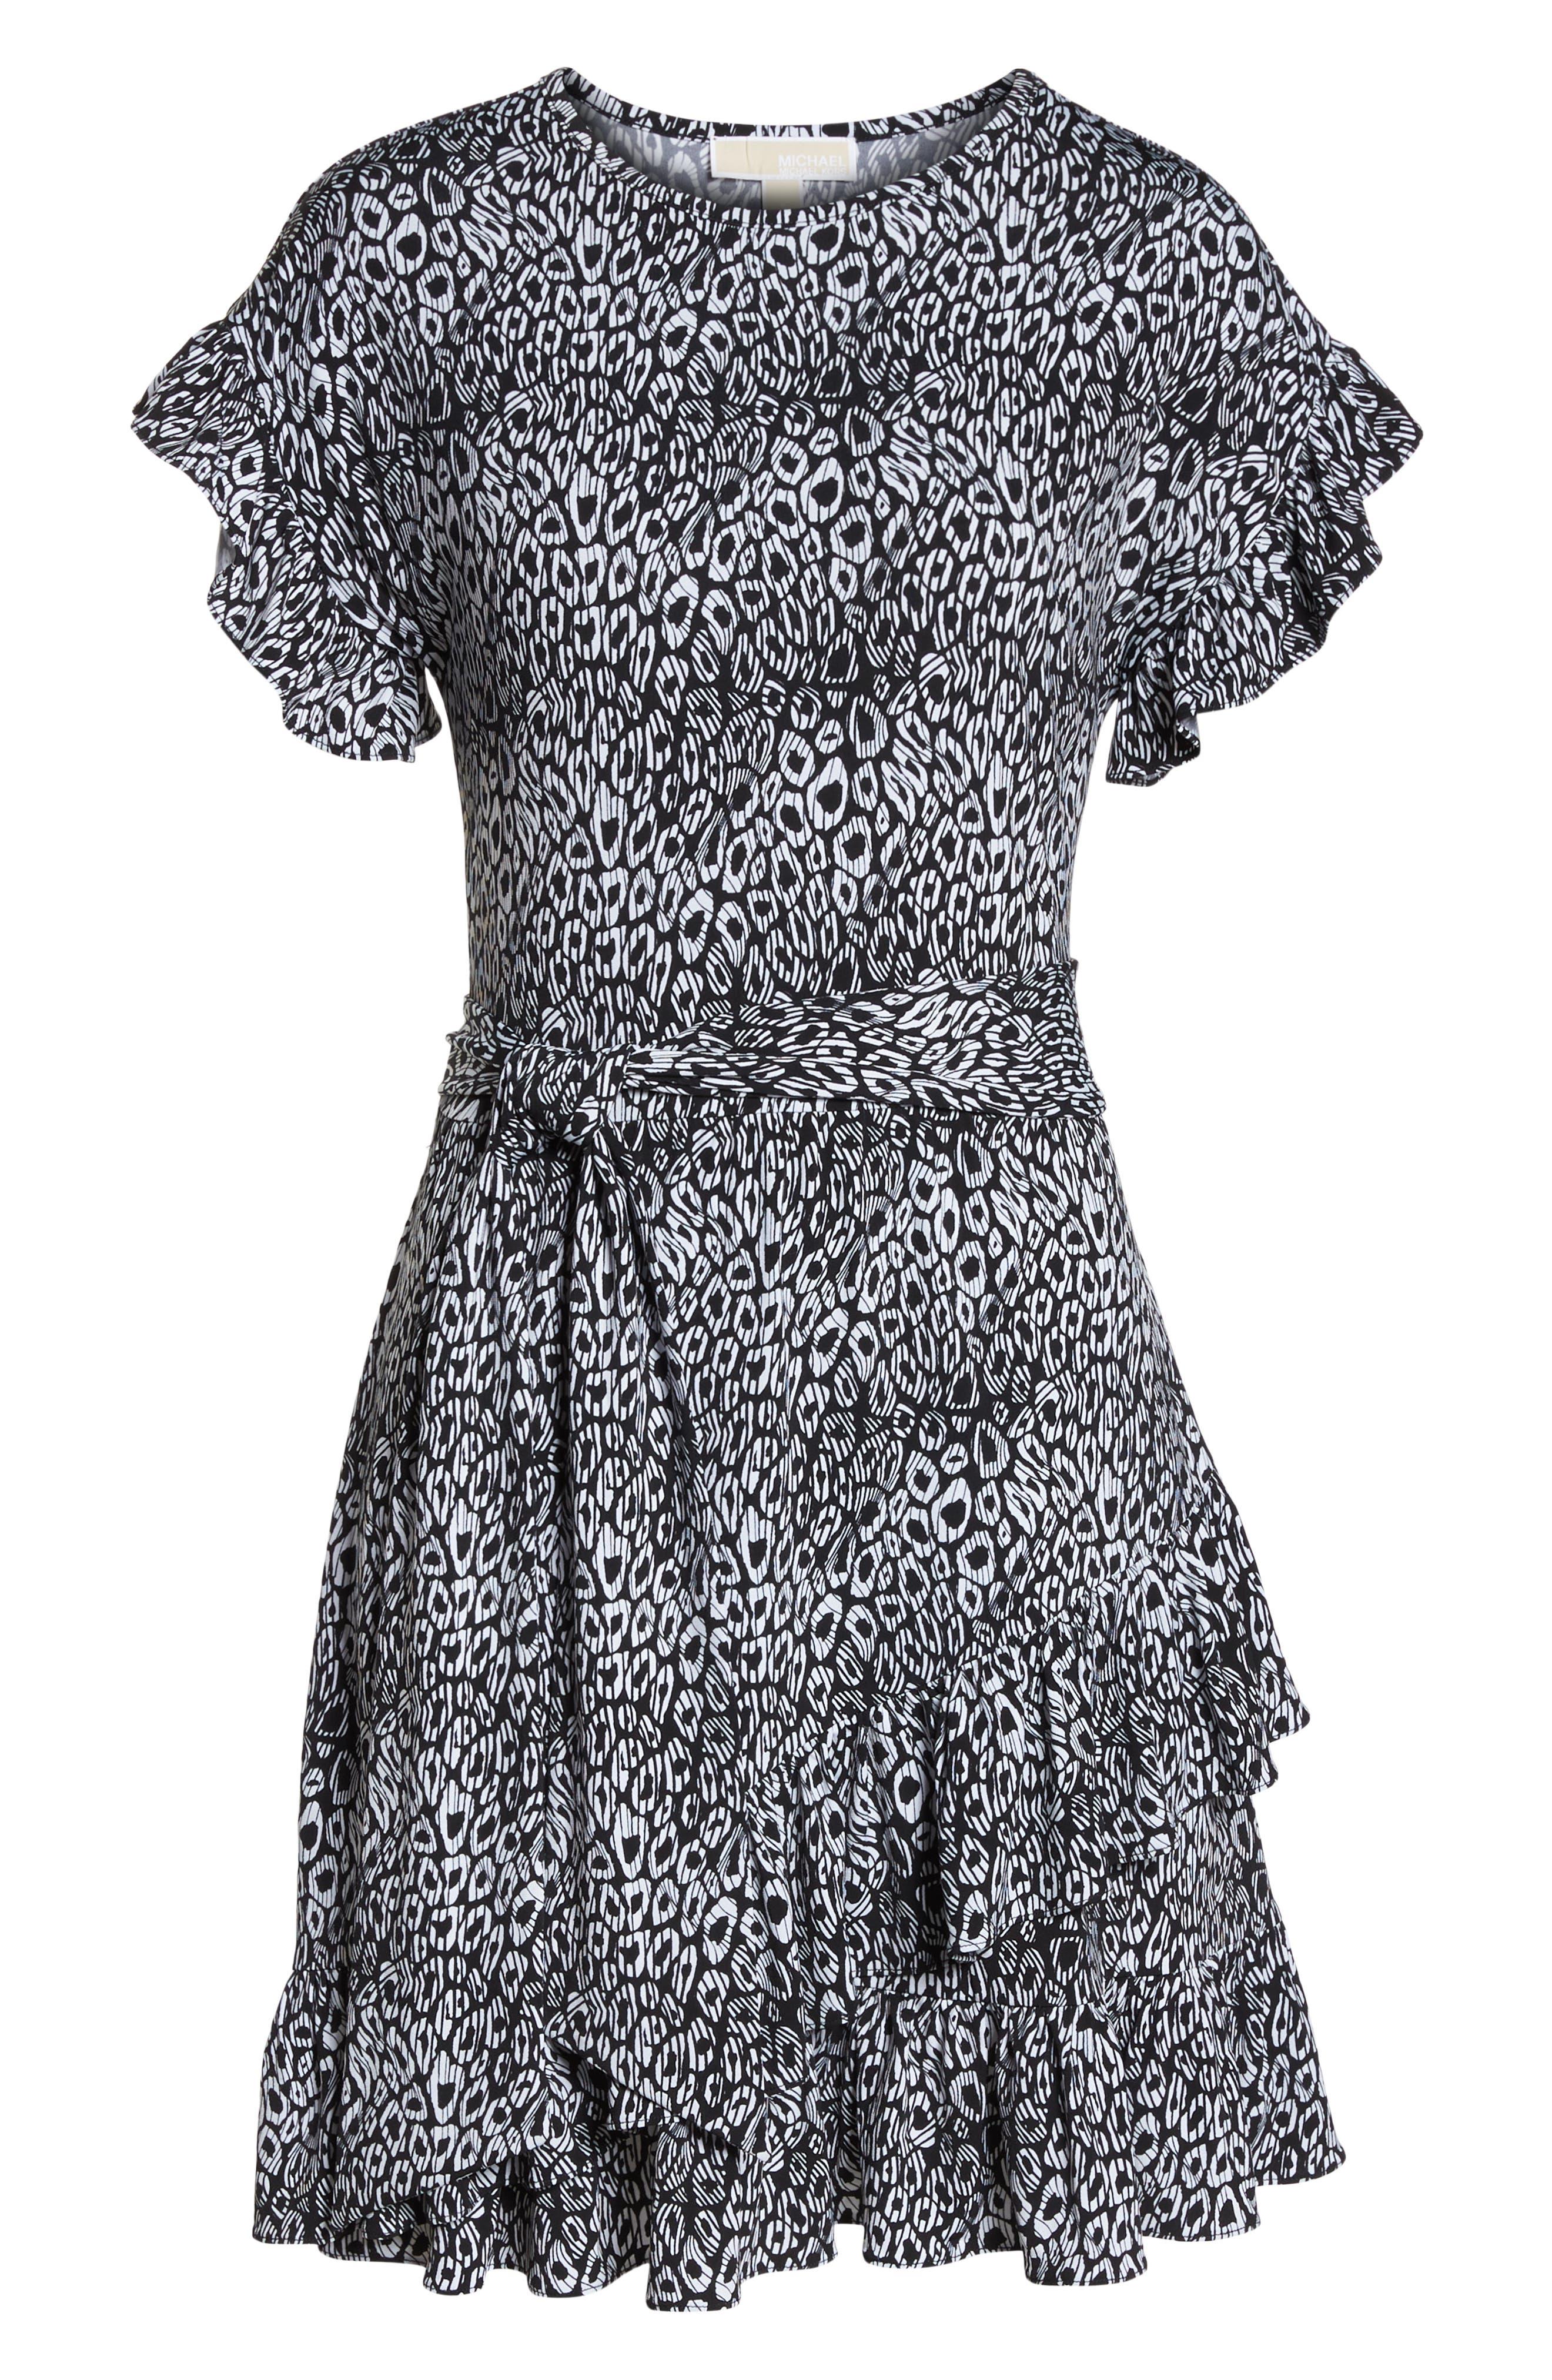 Wavy Leopard Print Ruffle Dress,                             Alternate thumbnail 7, color,                             Black/ White